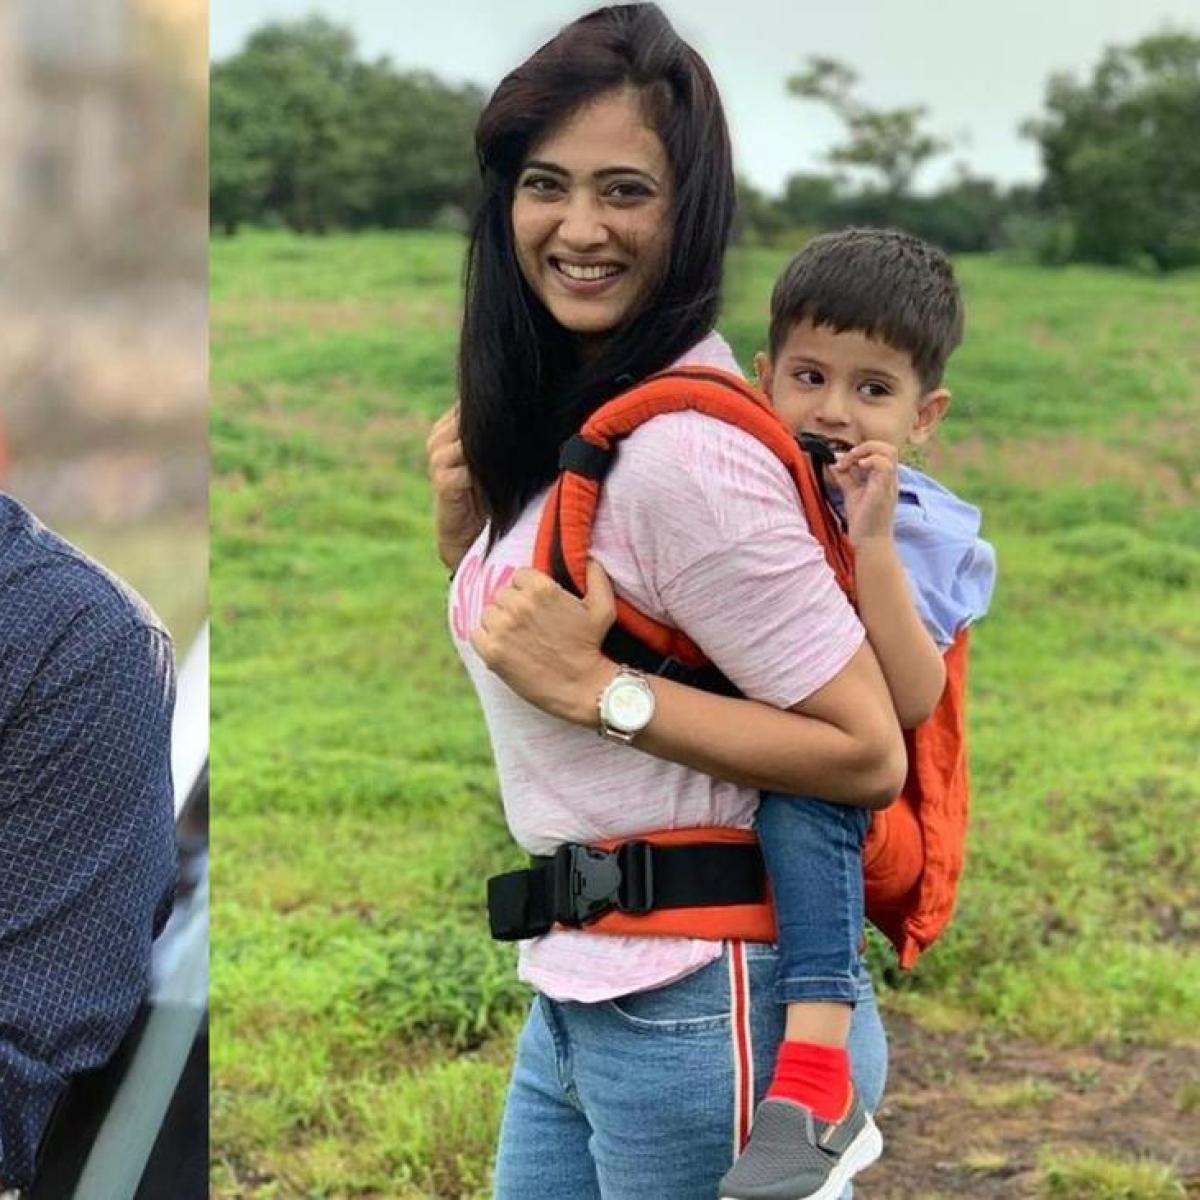 'My son is missing': Shweta Tiwari's estranged husband Abhinav Kohli claims he hasn't seen his baby boy for 5 days